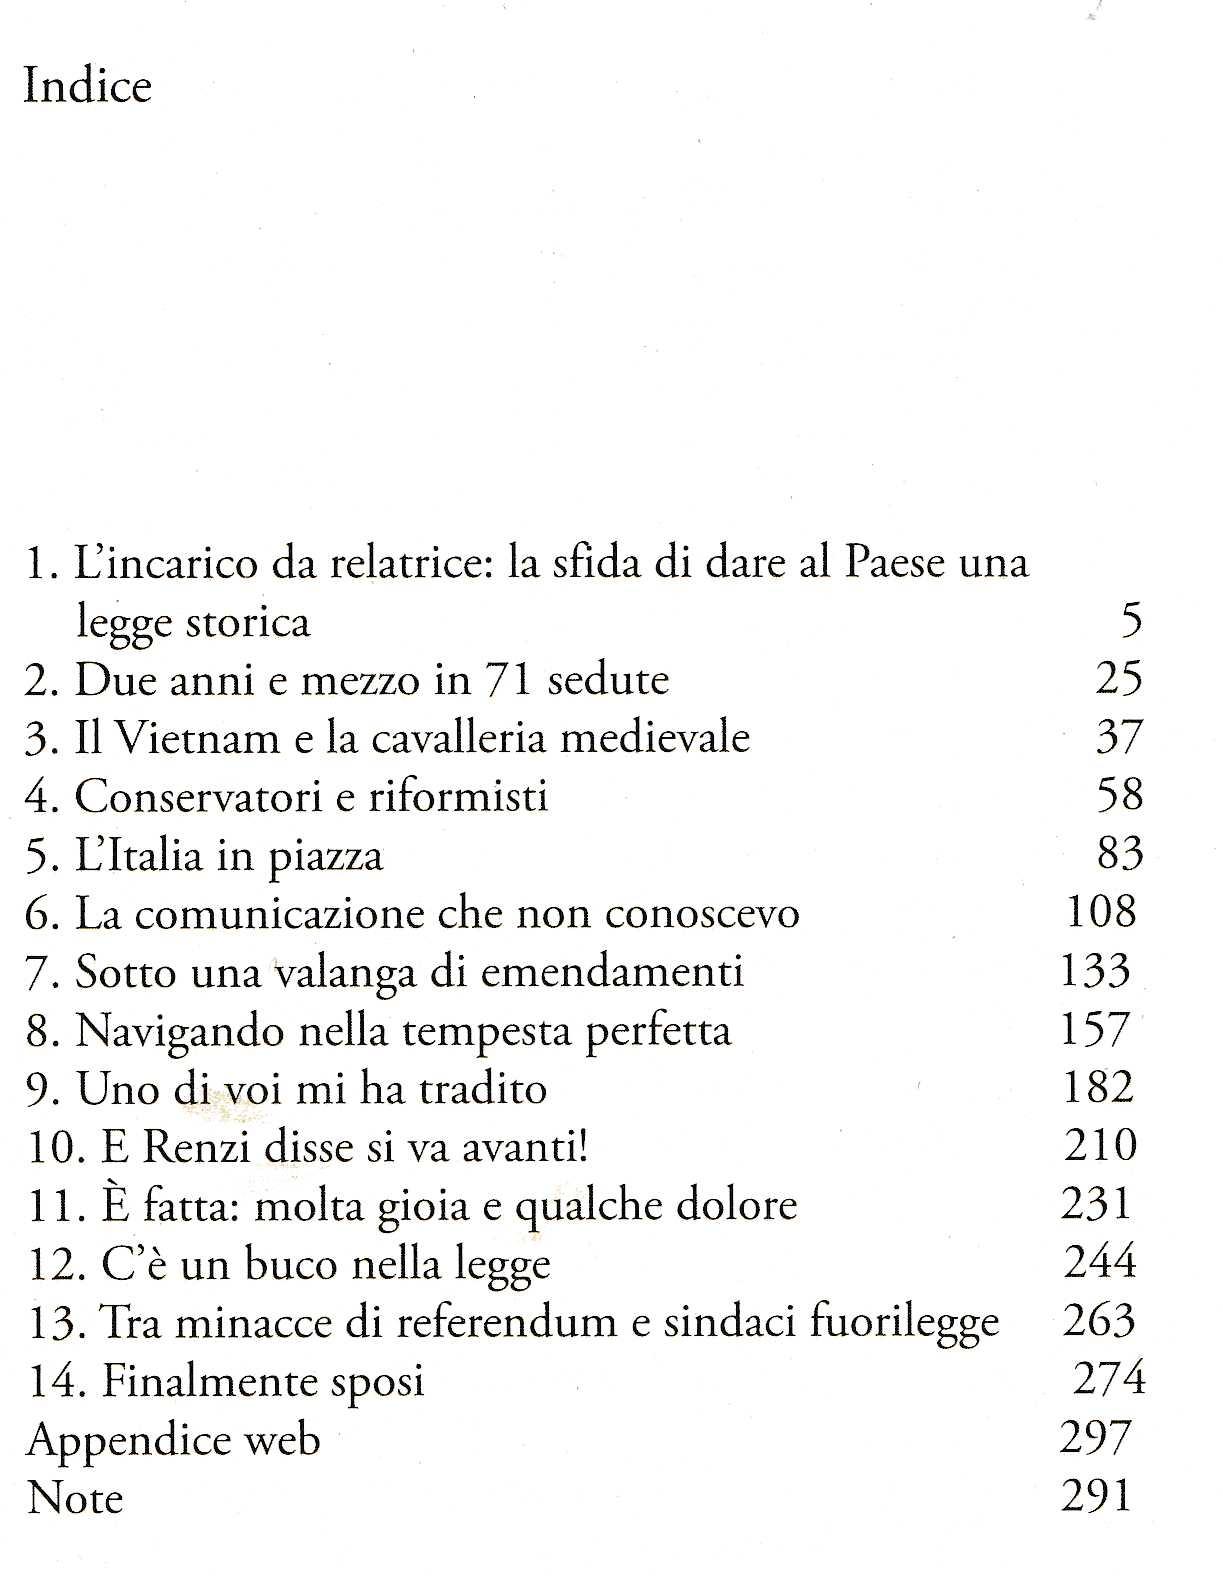 CIRINNA1286